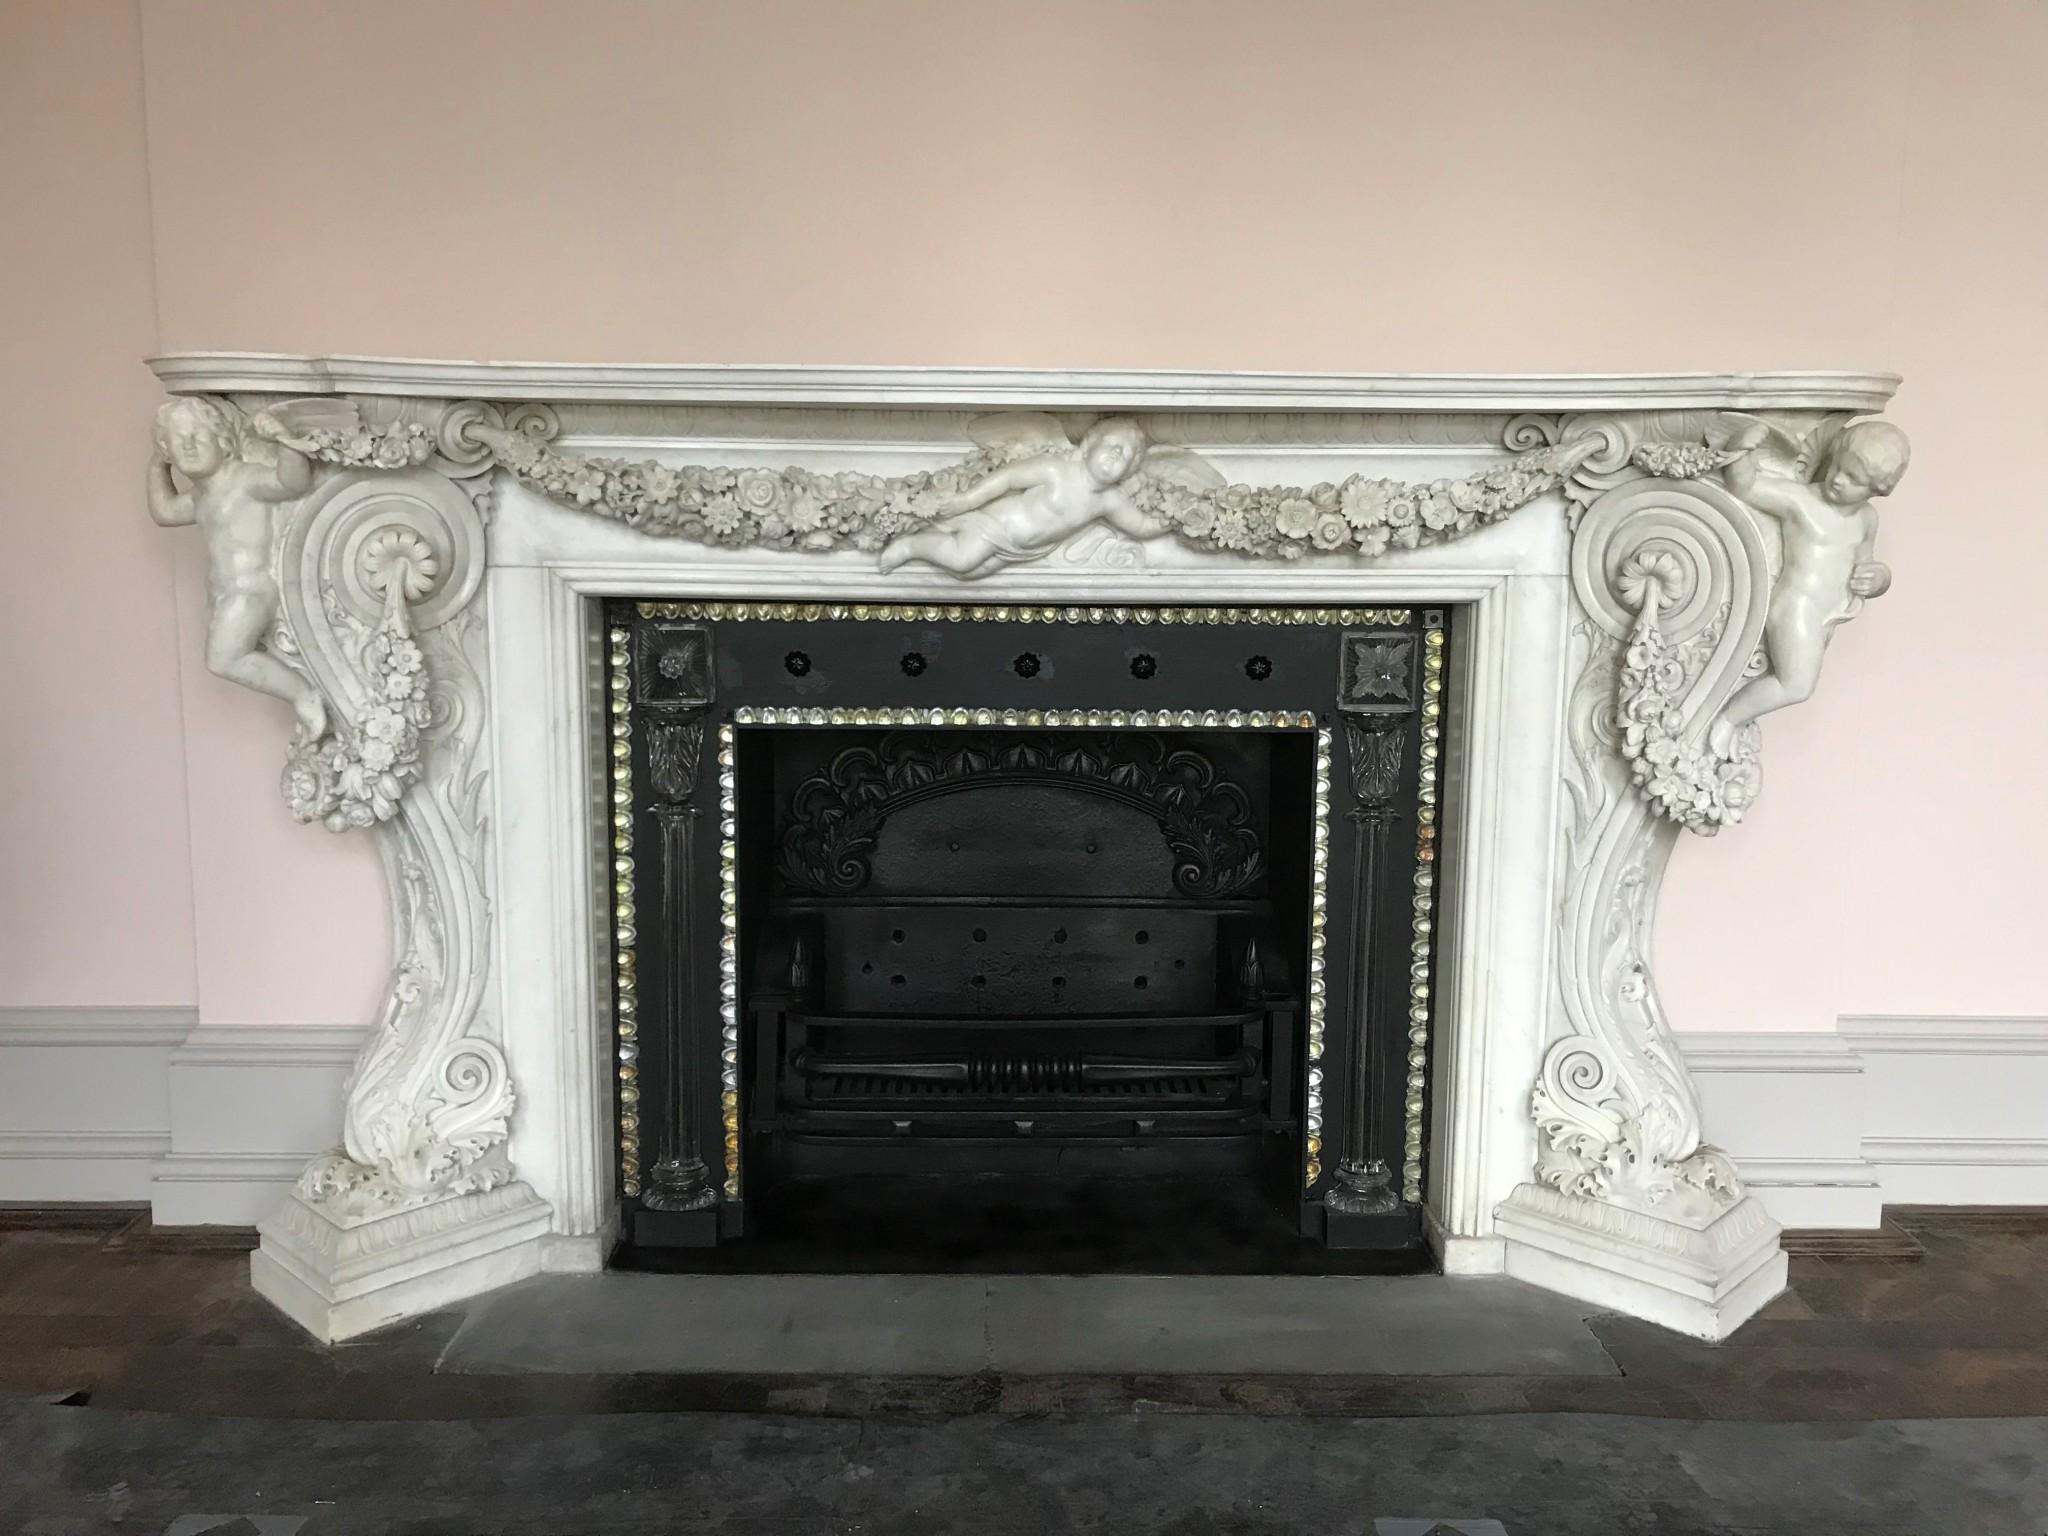 Grosvenor Crescent Embassy Fireplace Restoration